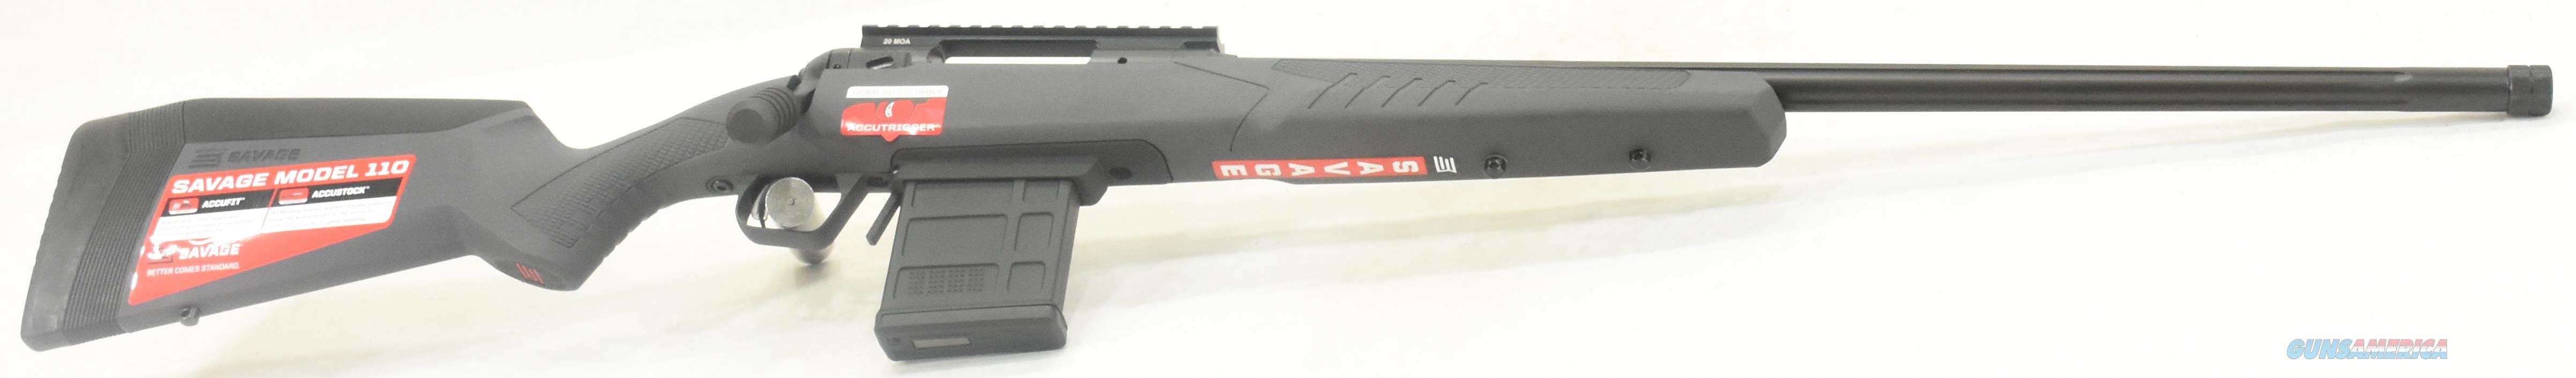 110 Tactical Grey 6.5CM 24In  57232  Guns > Rifles > Savage Rifles > 10/110